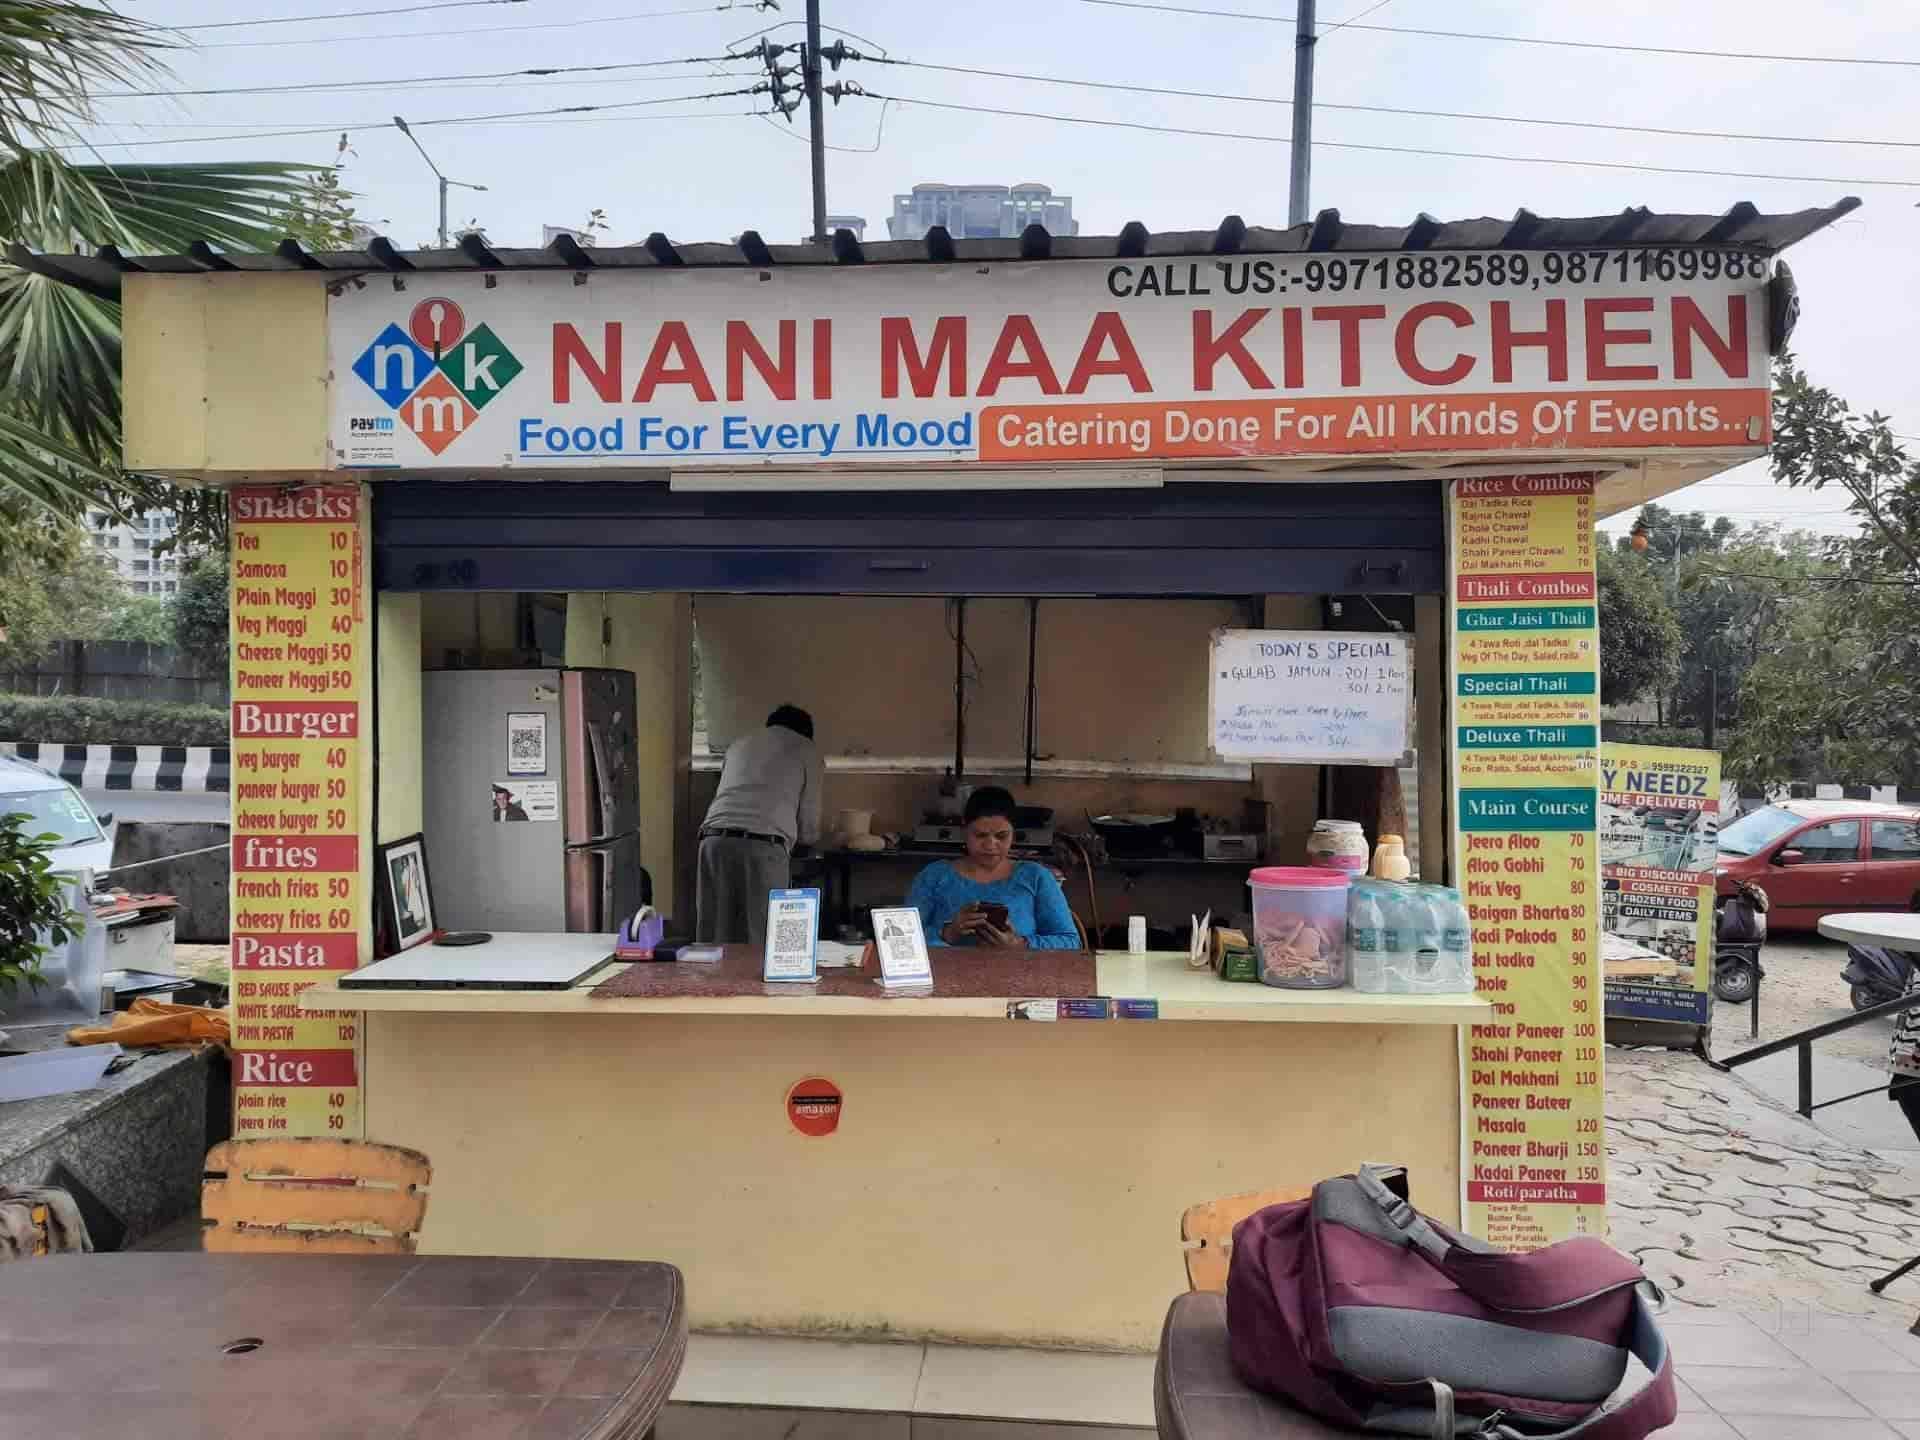 Nani Maa Kitchen, Noida Sector 75